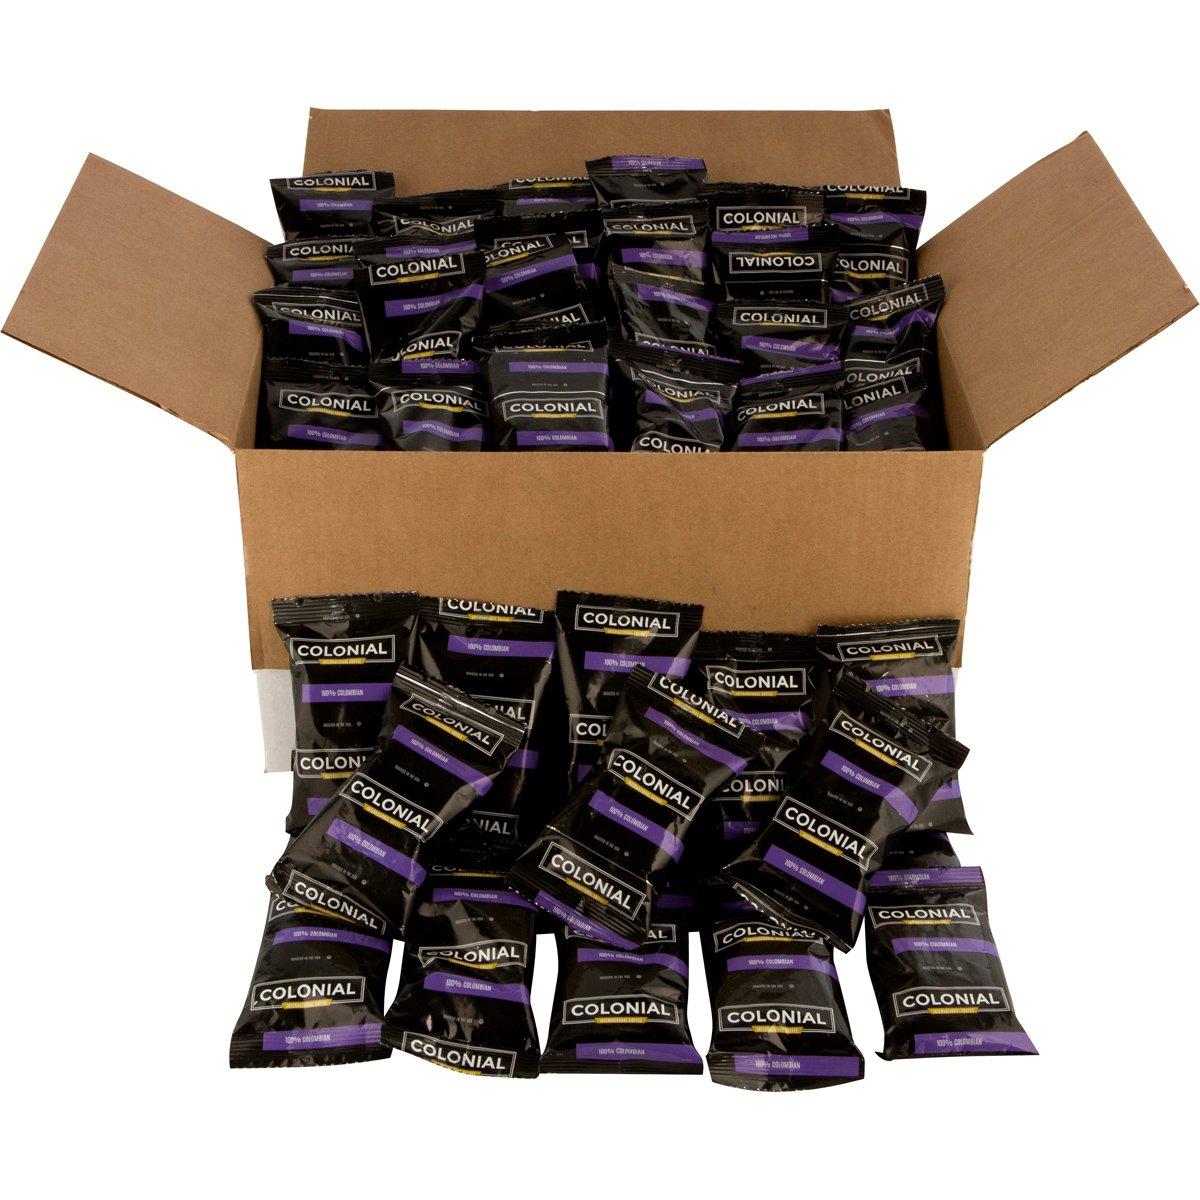 Colonial Coffee, 100% Colombian, Medium Roast Ground Coffee, 2.5 OZ Fraction Packs, 100 COUNT box, Bulk Bags